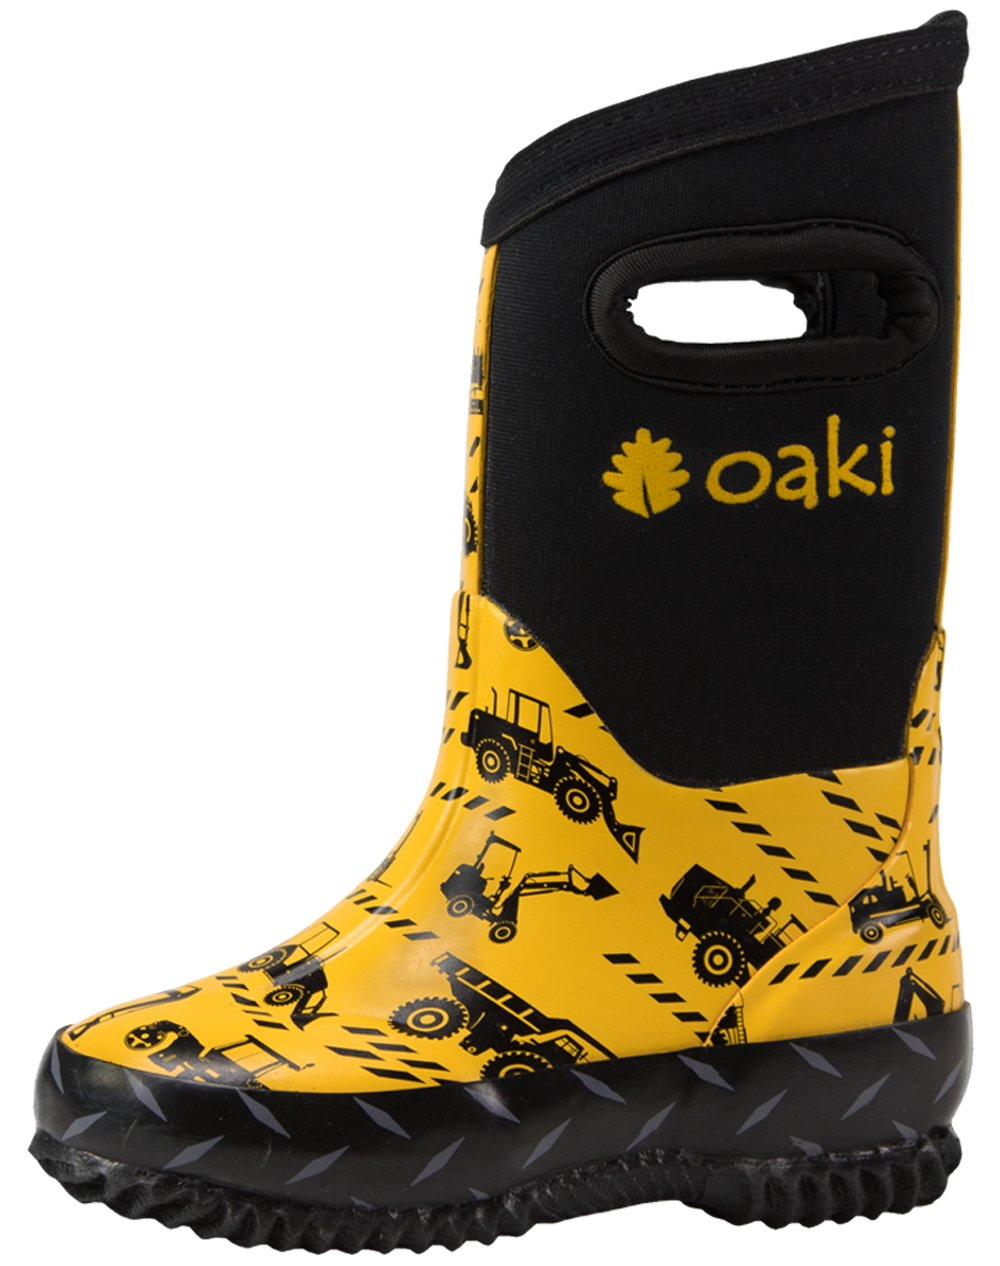 Oakiwear Children's Neoprene Rain Boots, Snow Boots, Muck Boots, Construction Vehicles 13T